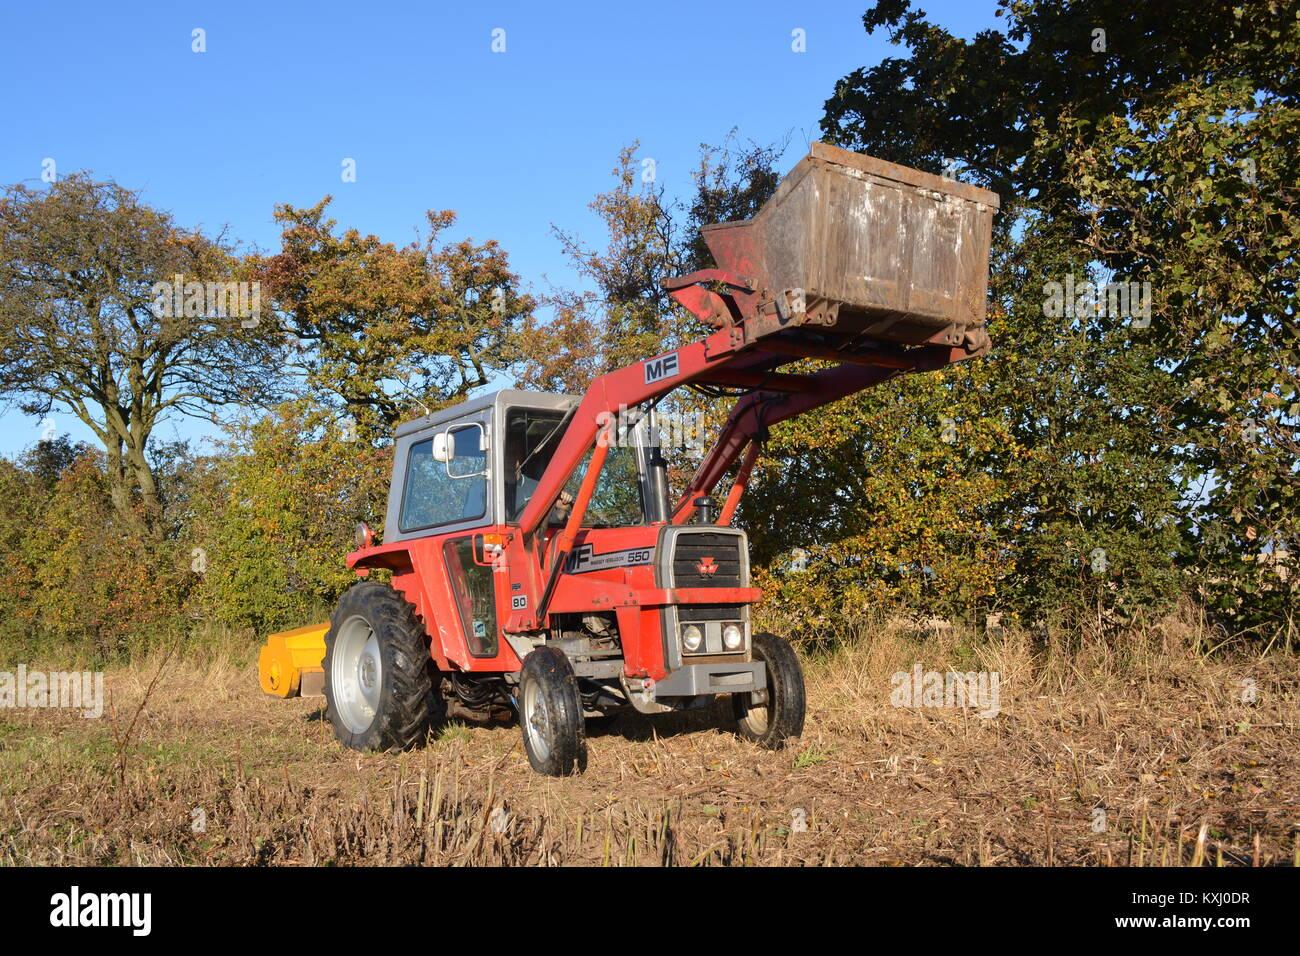 Massey Ferguson MF550 Tractor - Stock Image